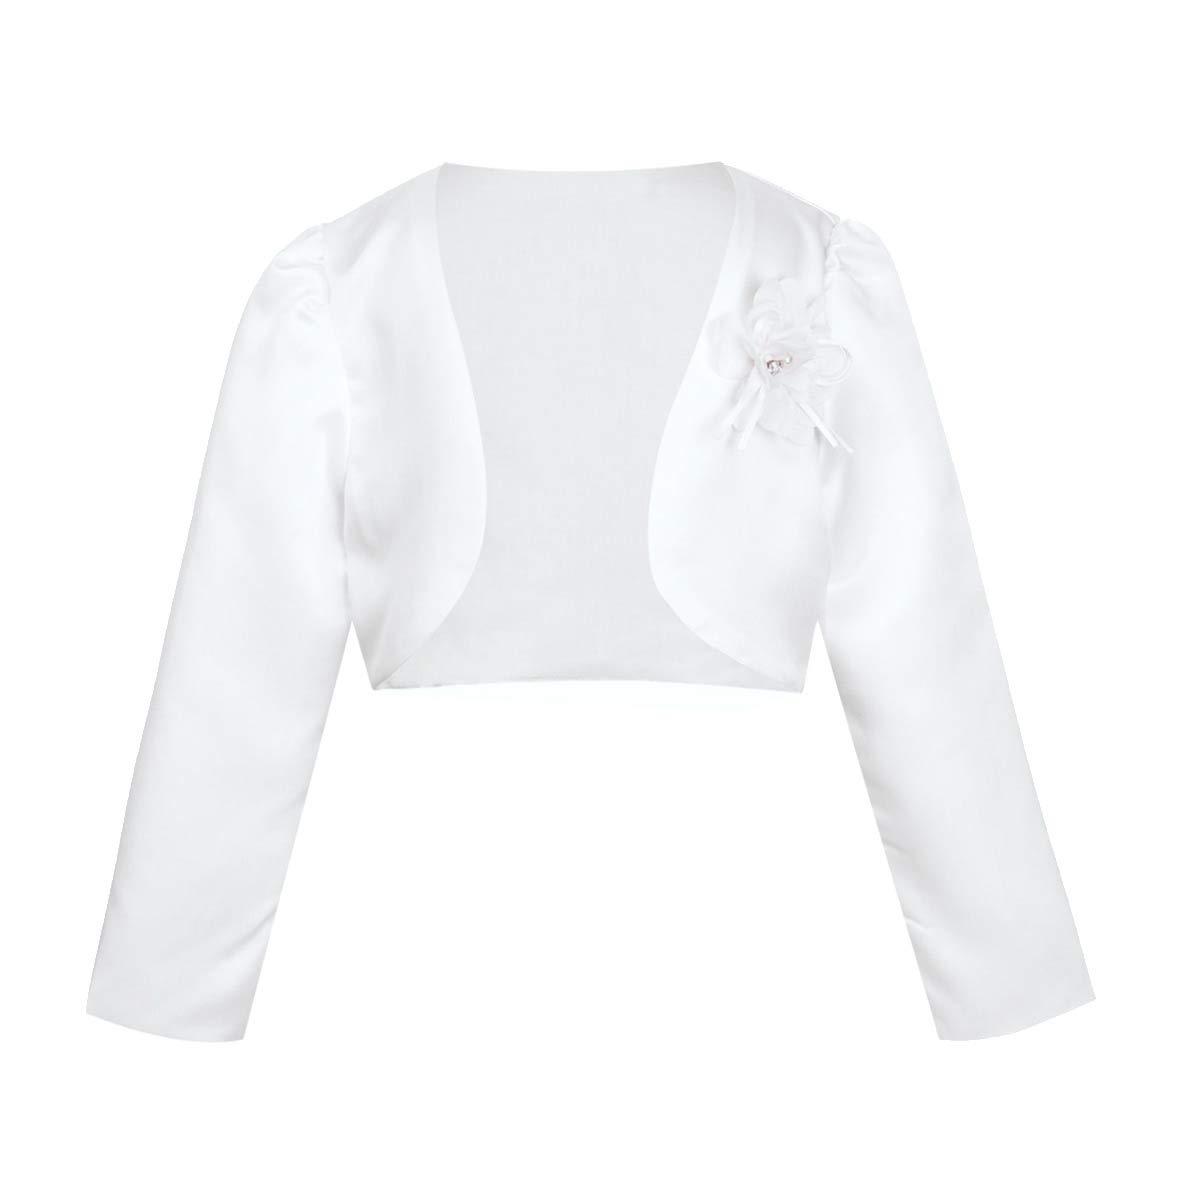 Alvivi Kids Girls Long Sleeve Beaded Satin Bolero Shrug Jacket Short Cardigan Wedding Party Flower Dress Cover up White 5-6